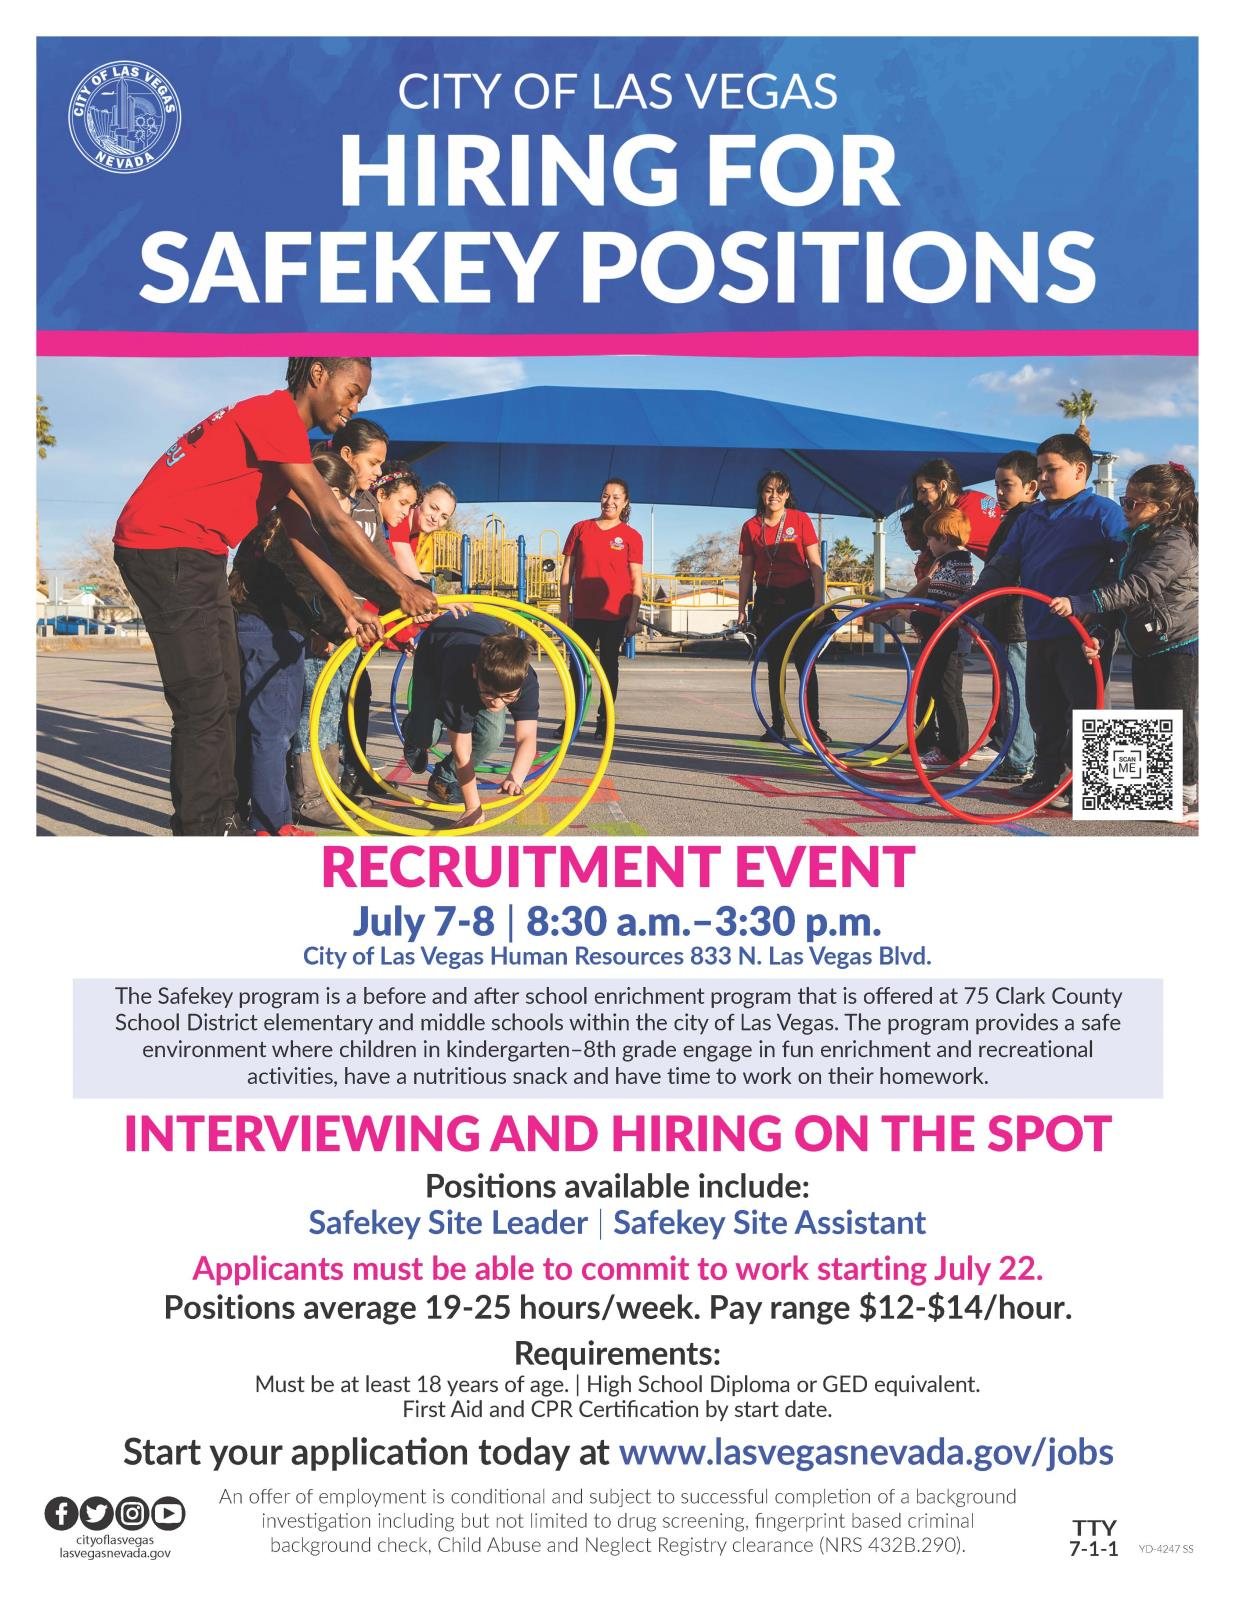 Safekey Summer Hiring flyer-6.3.21.jpg